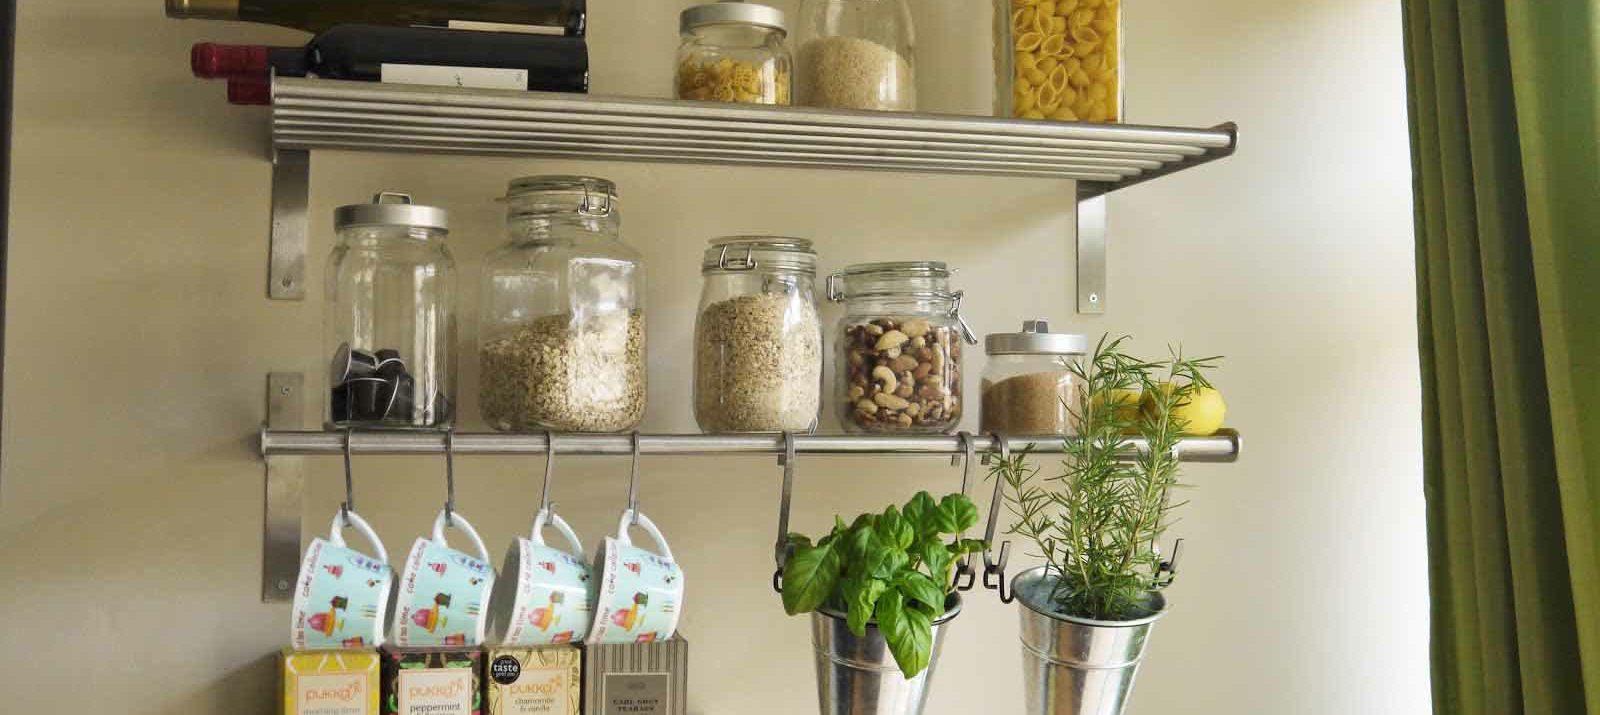 Easy Food-Storage Ideas